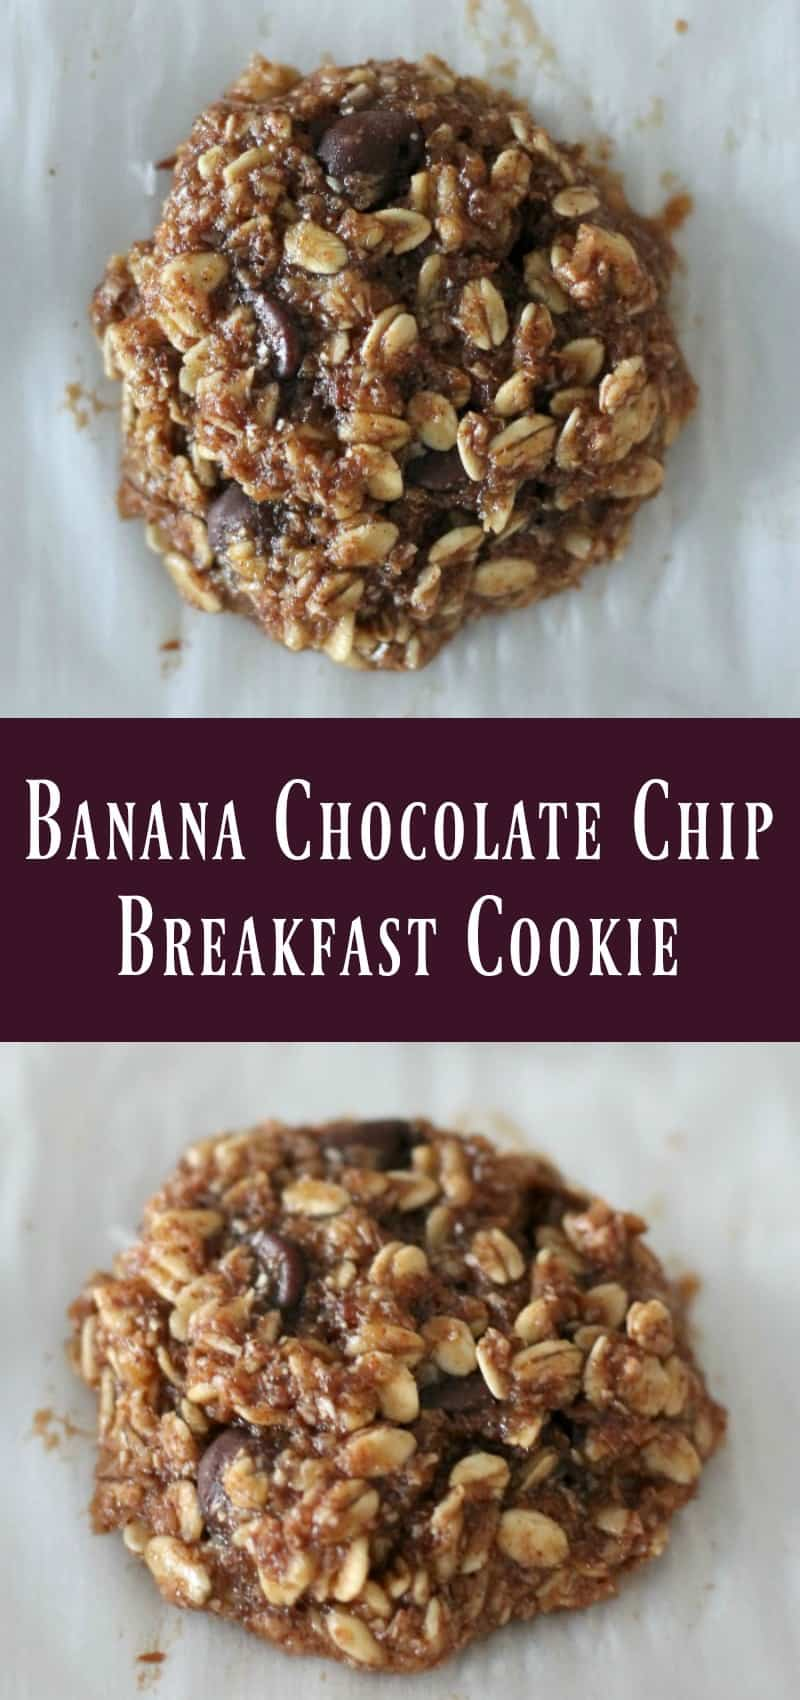 Banana Chocolate Chip Breakfast Cookie Recipe